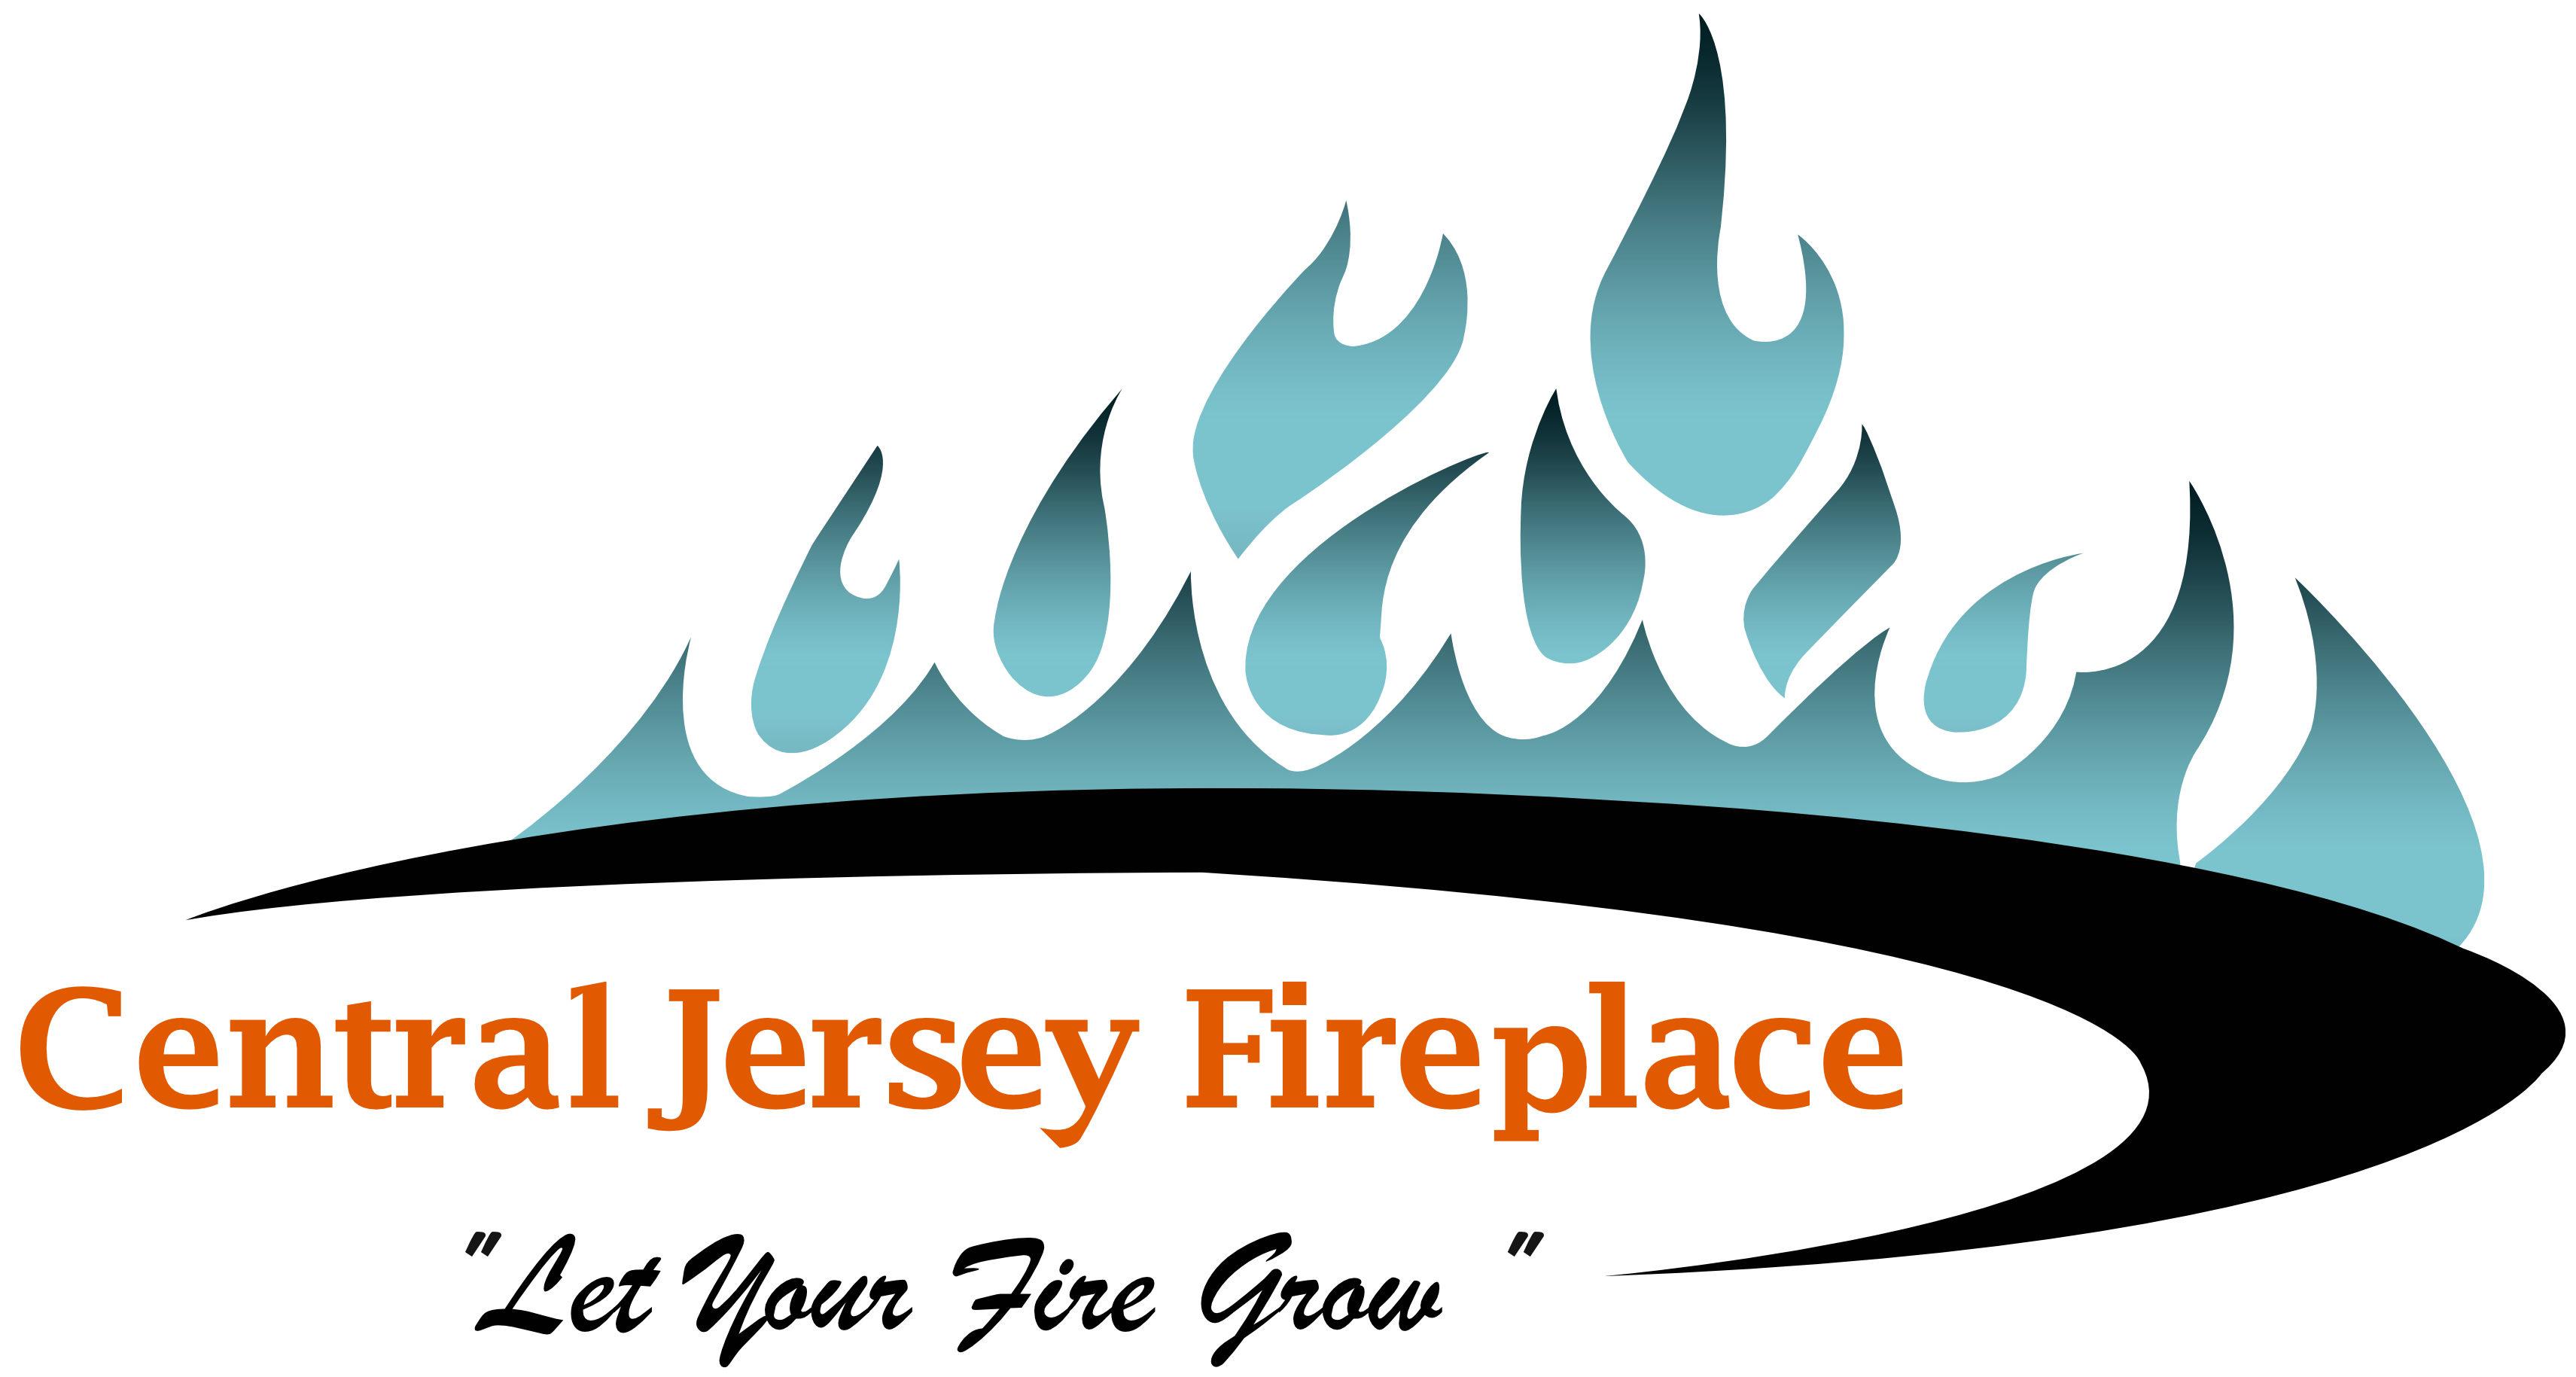 Central Jersey Fireplace